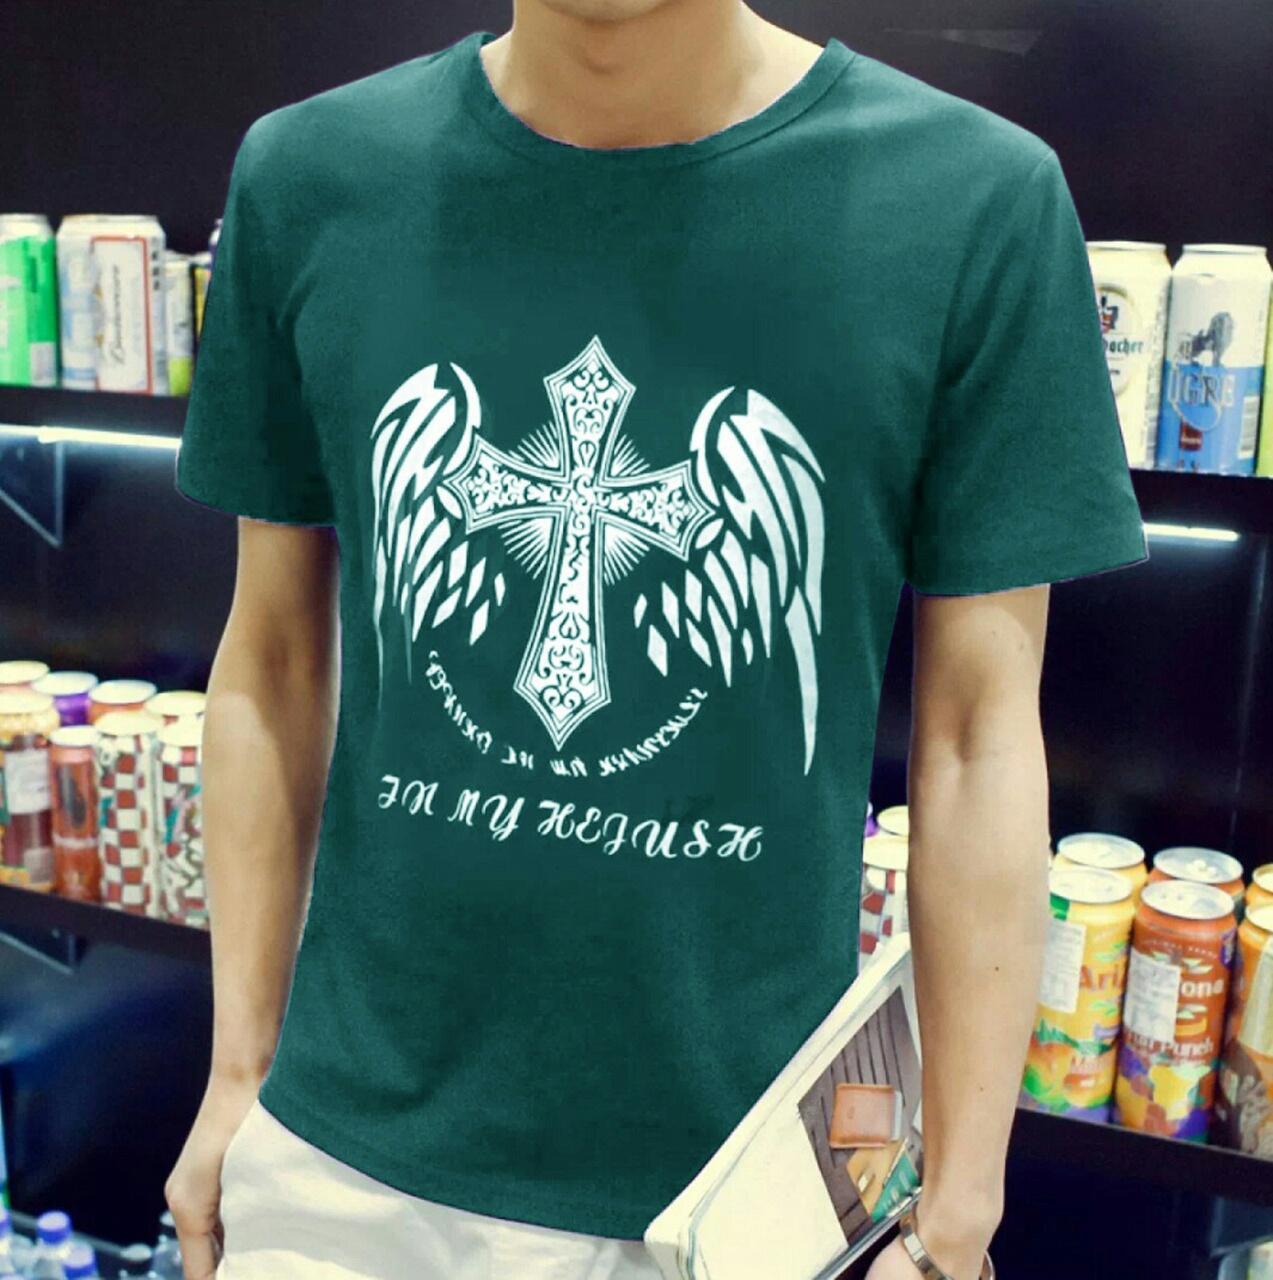 Popuri Fashion Kaos Vross - Spandek Lengan Pendek T-Shirt Atasan Pria Kaos T-Shirt Baju Murah Tshir